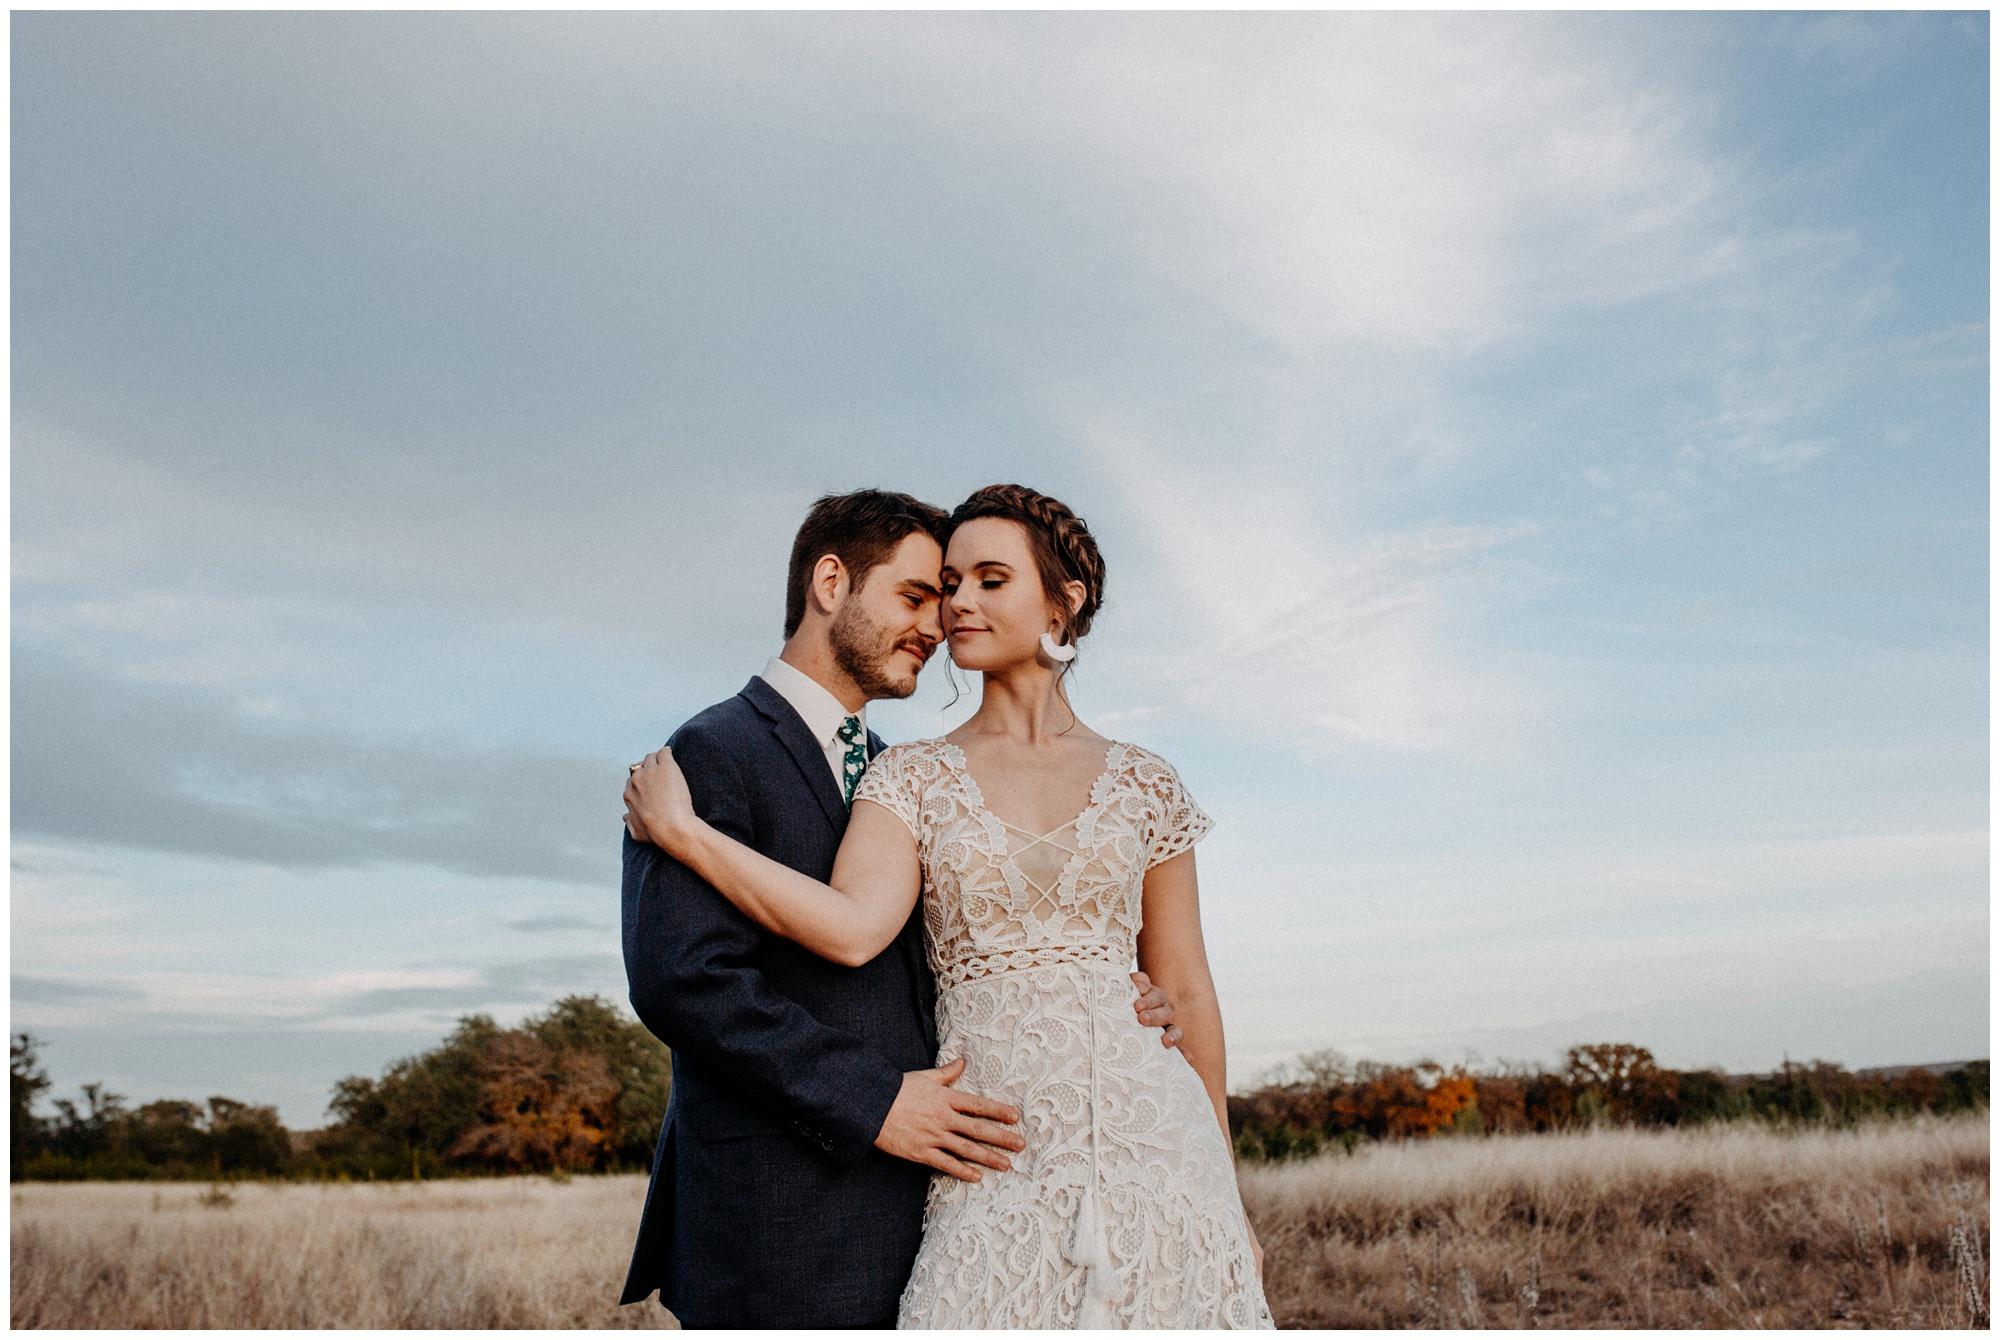 AUSTIN-TEXAS-PROSPECT-HOUSE-WEDDING-VENUE-PHOTOGRAPHY25830.JPG